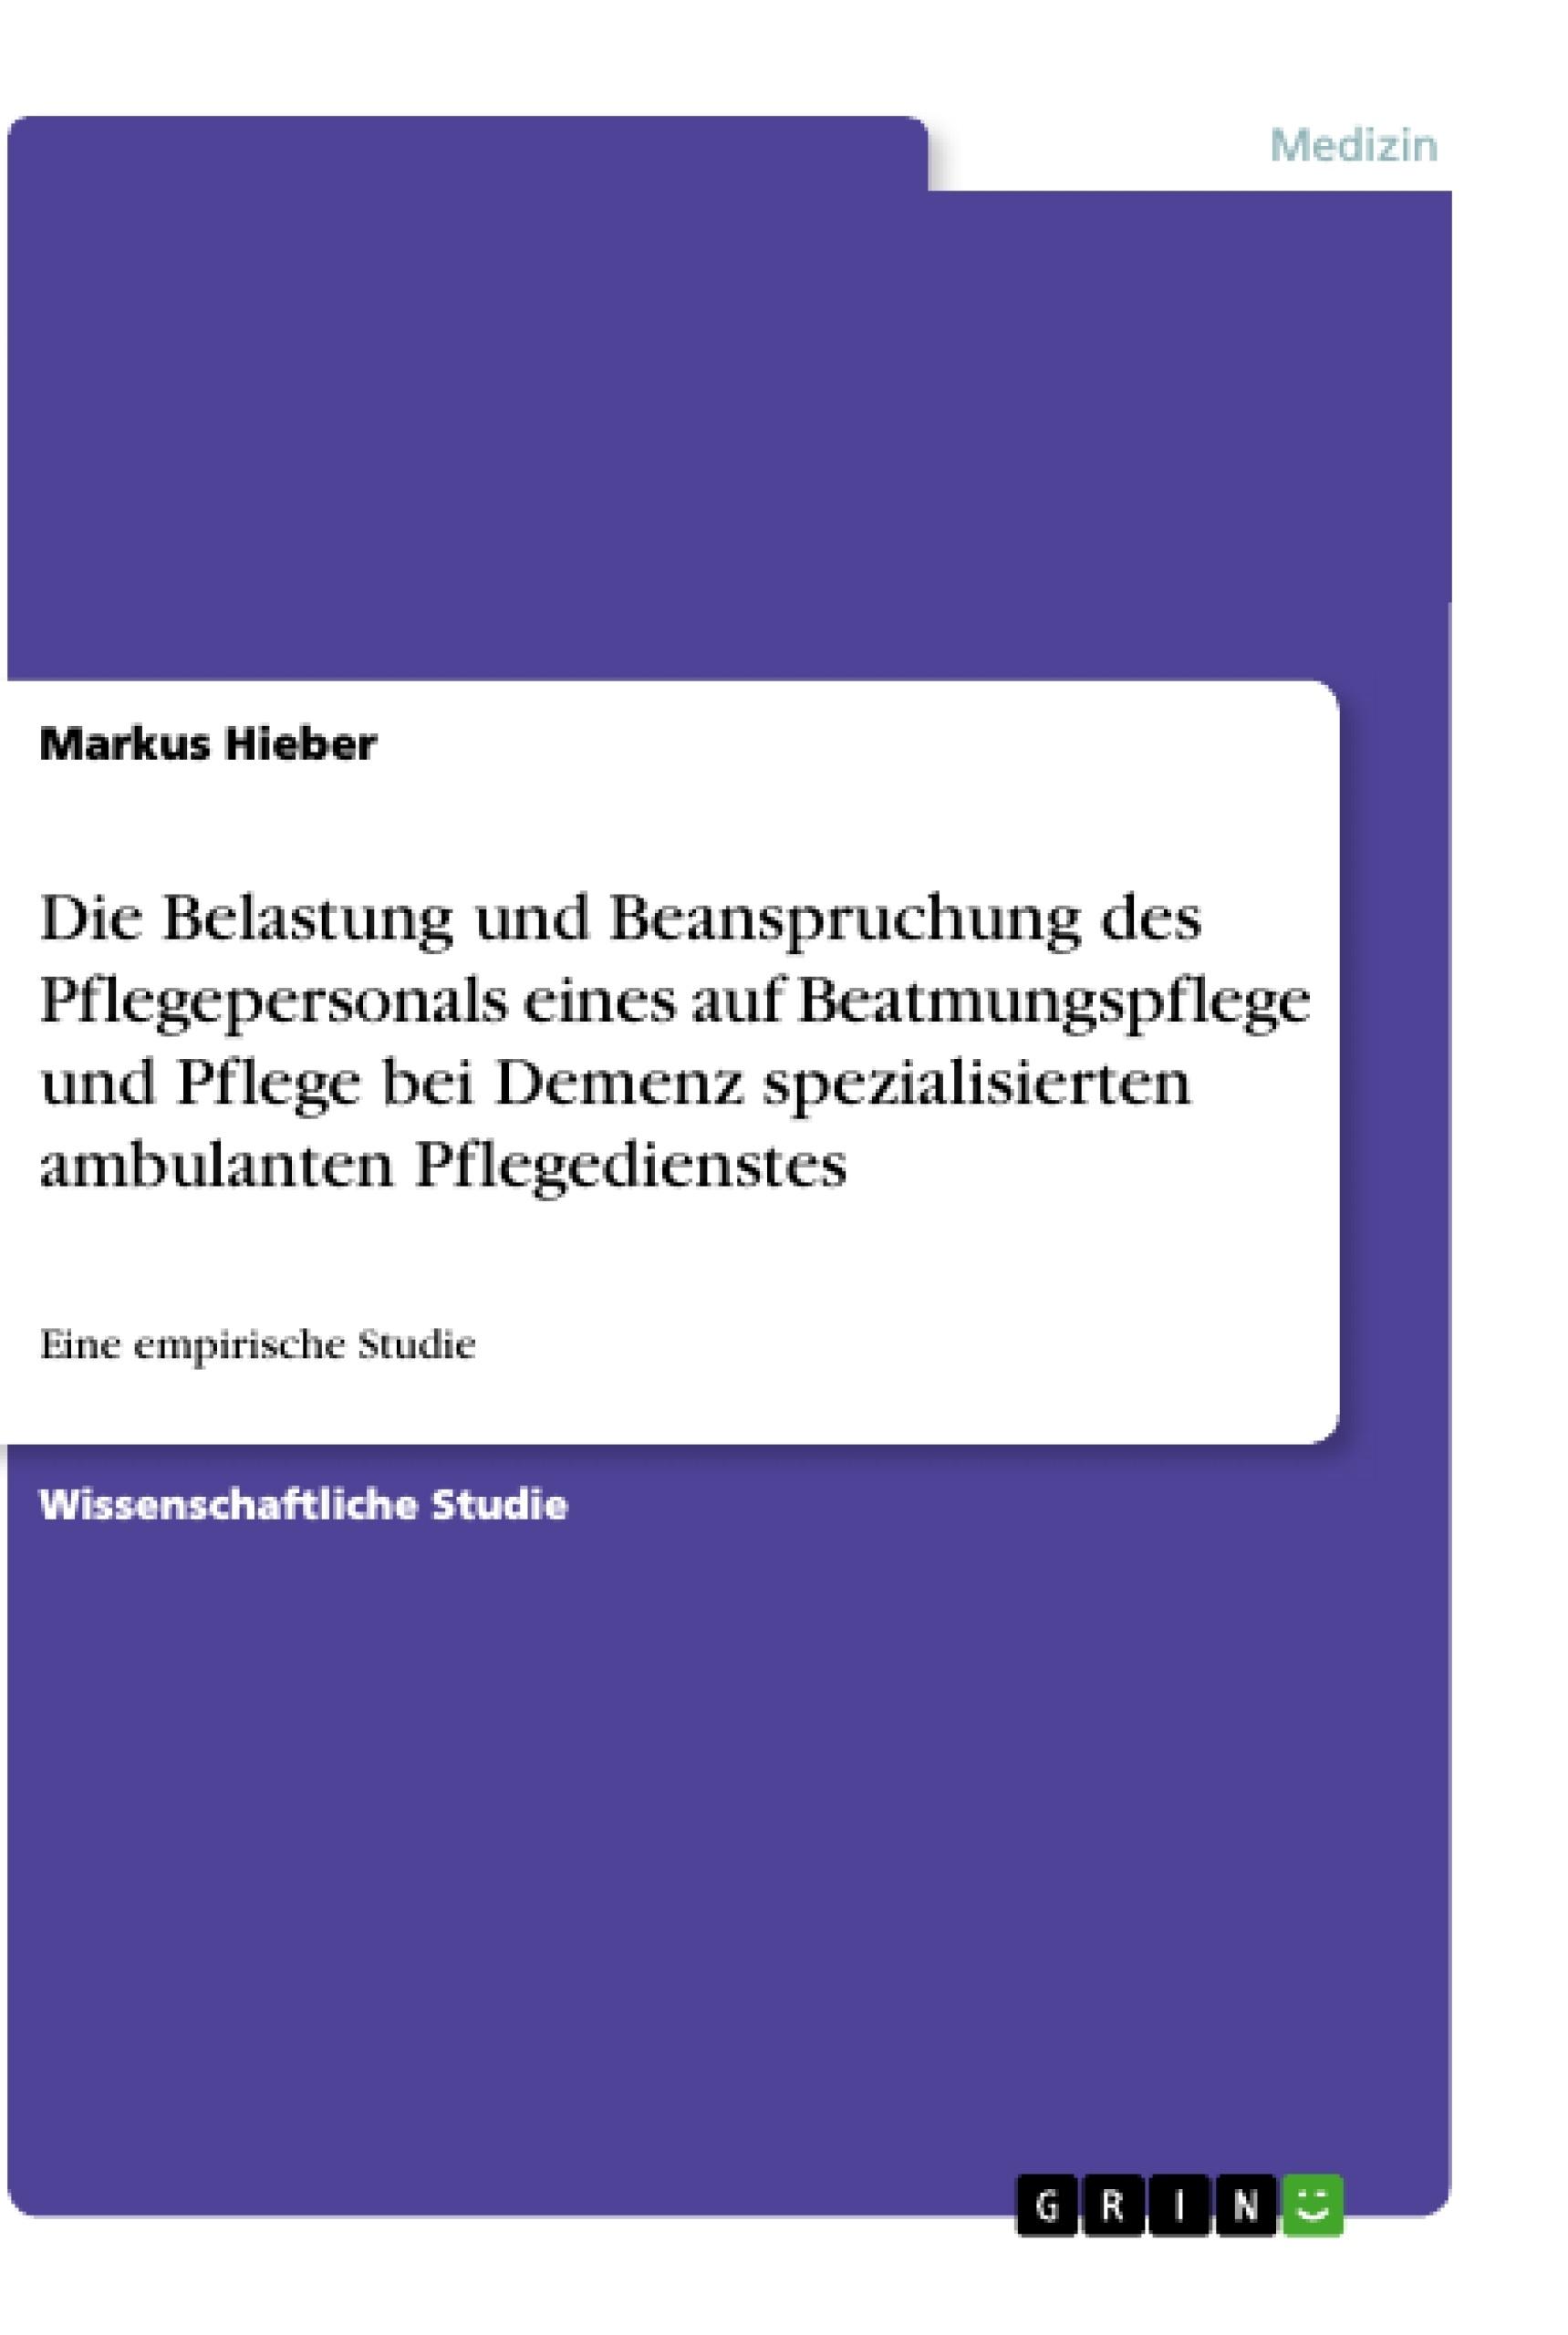 Wunderbar Pflege Grad Ebene Bilder - Anatomie Ideen - finotti.info